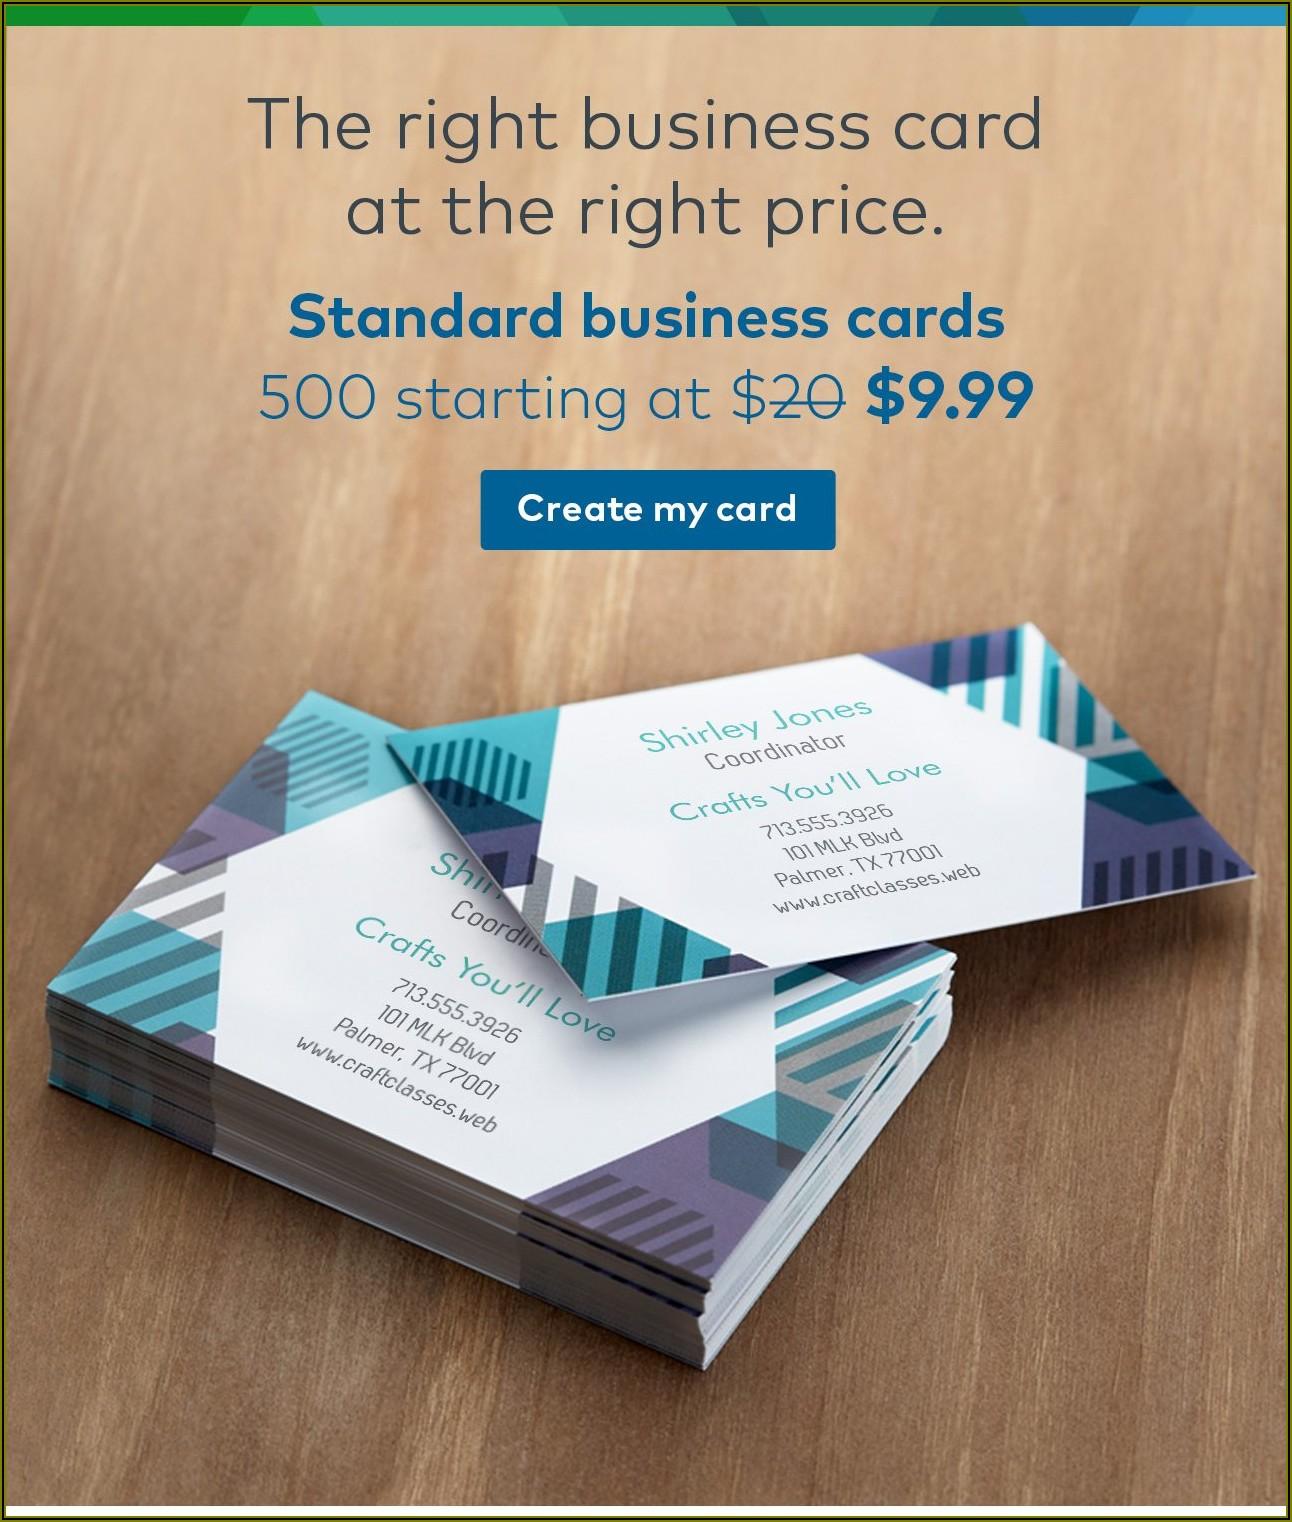 Vistaprint 500 Business Cards For $20